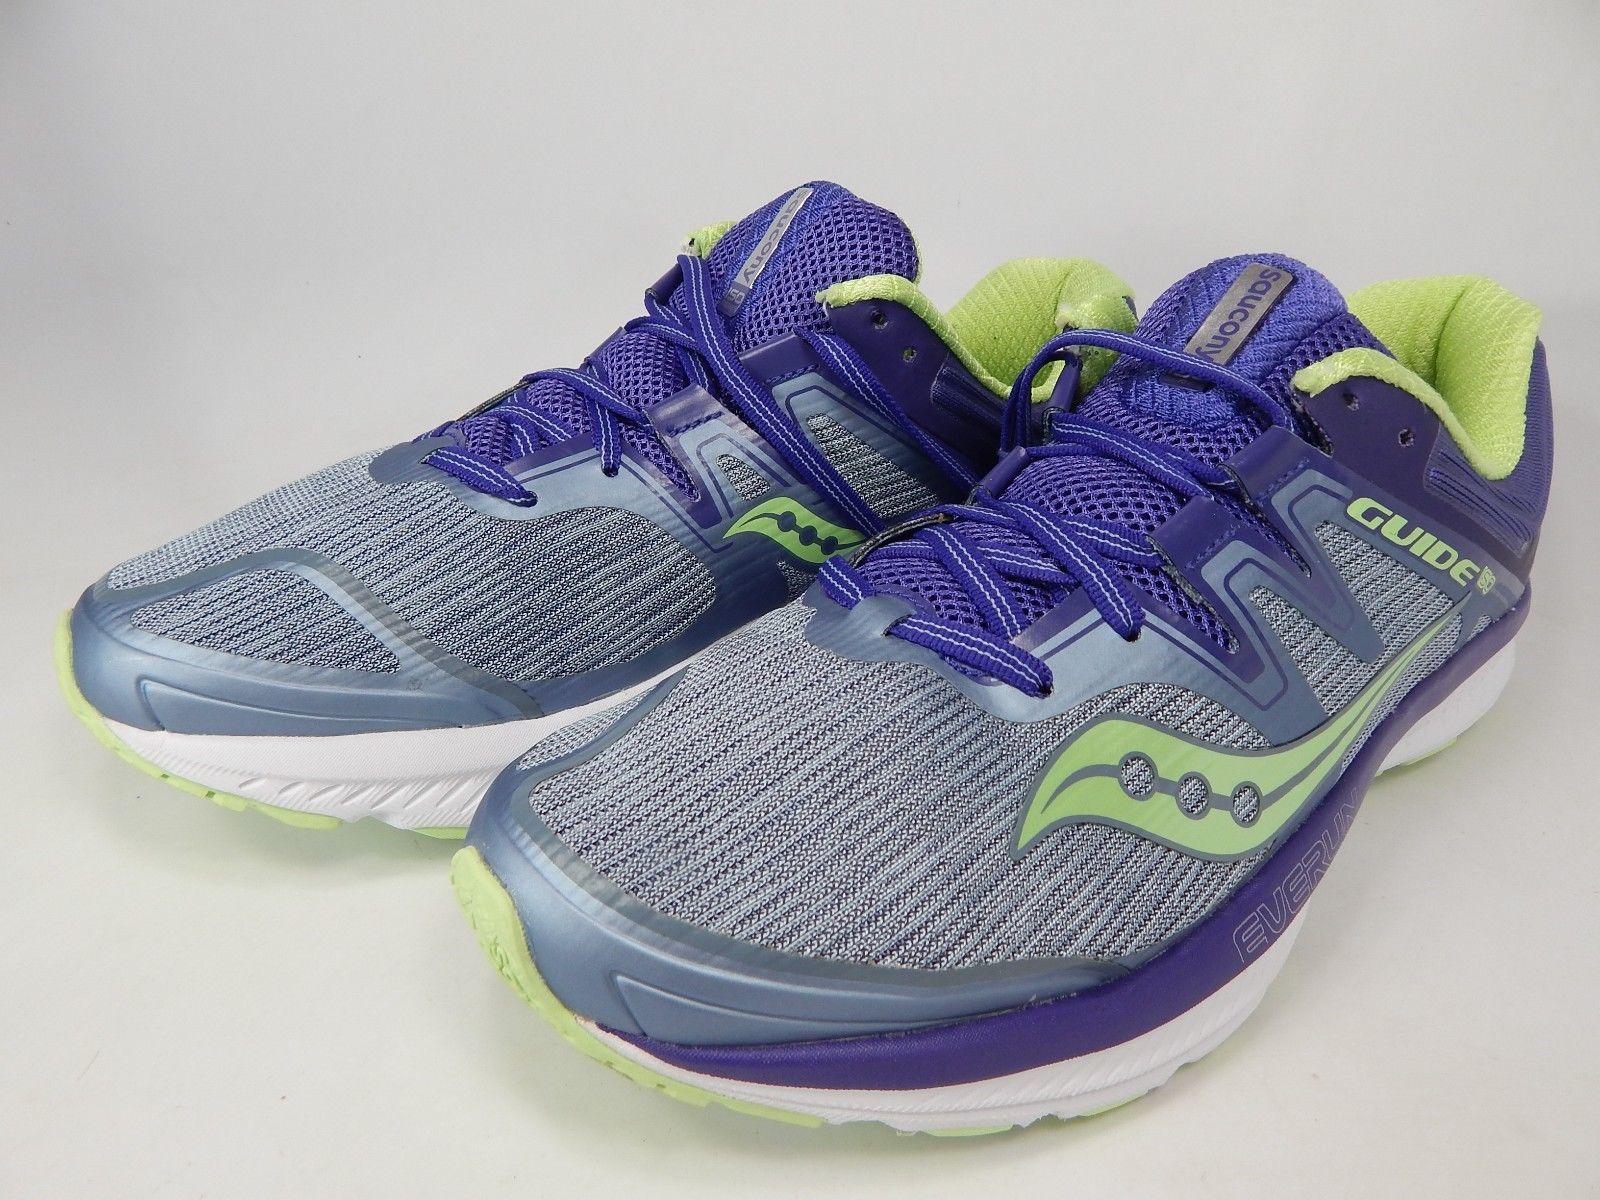 Saucony Guide ISO Size 11 M (B) EU 43 Women's Running Shoes Purple Gray S10415-1